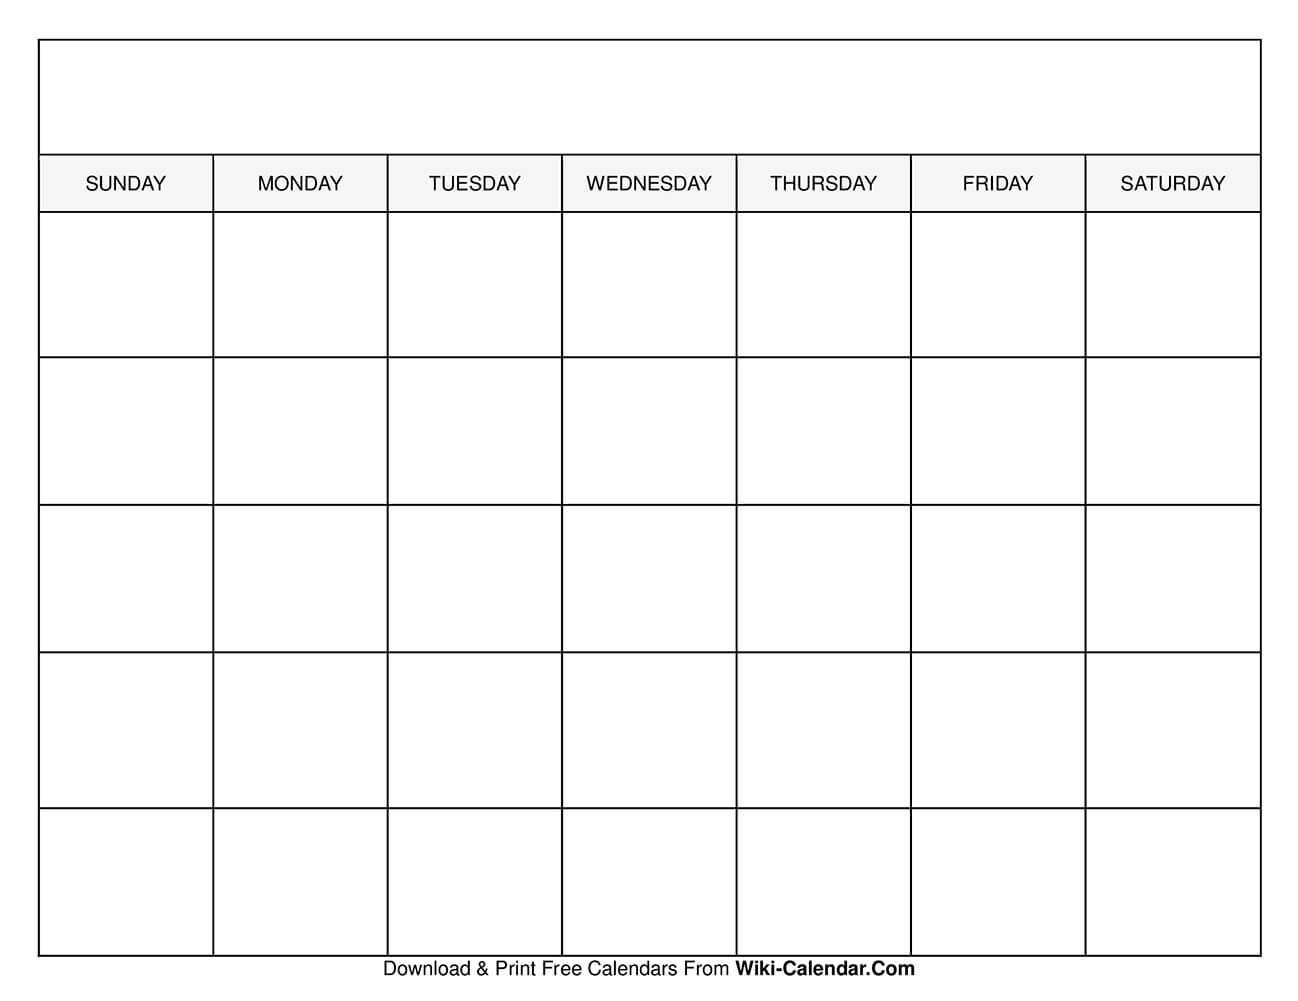 Printable Blank Calendar Templates-Printable Monthly Calendar Monday Start